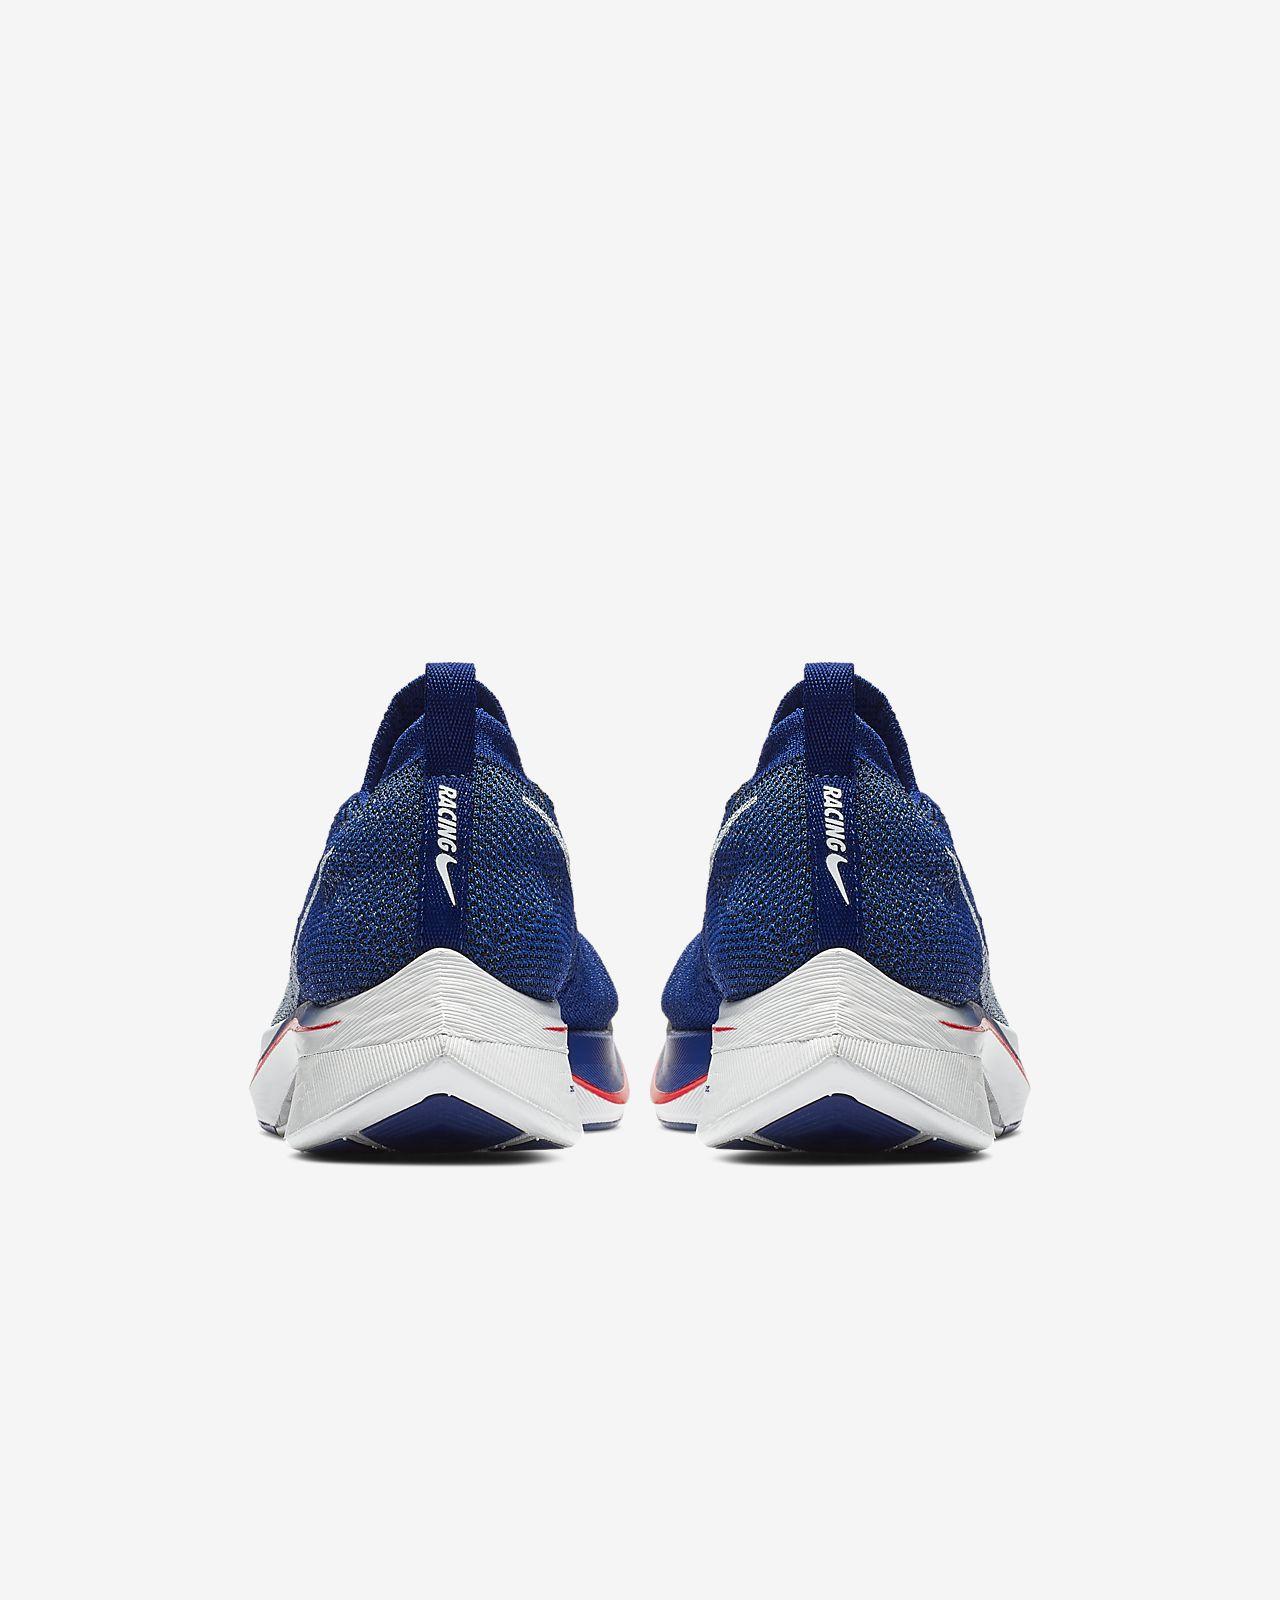 90f94d2eeba6b Nike Vaporfly 4% Flyknit Running Shoe. Nike.com